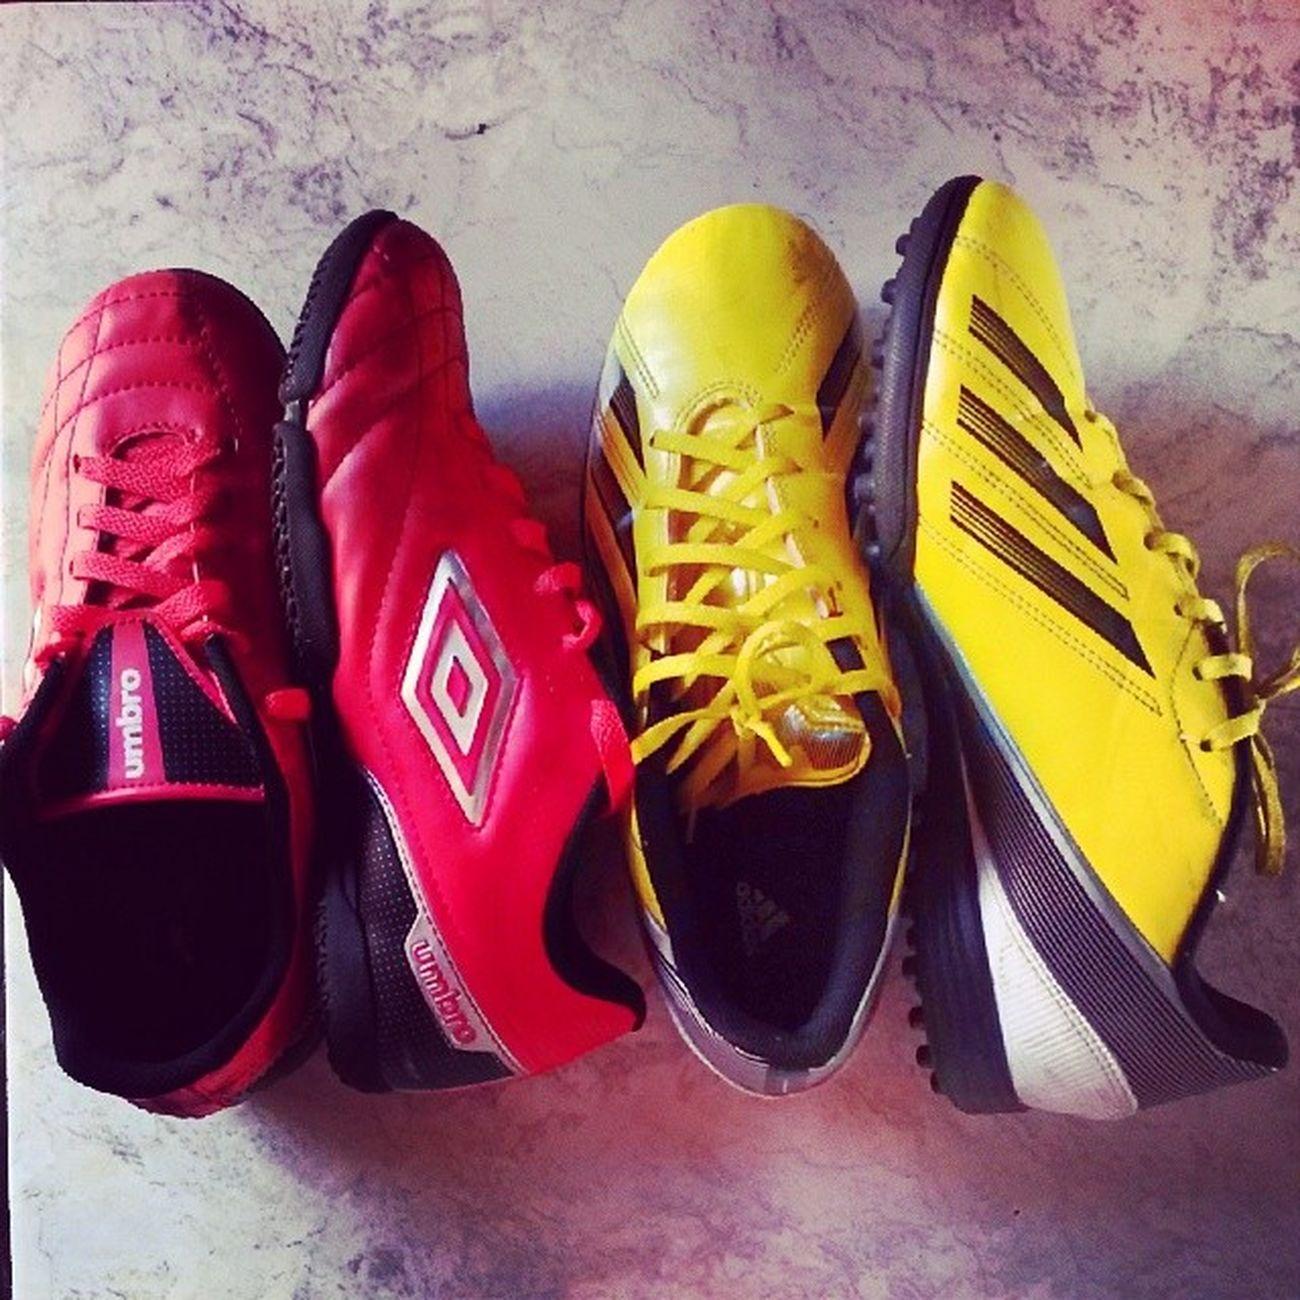 Umbro Vs Adidas